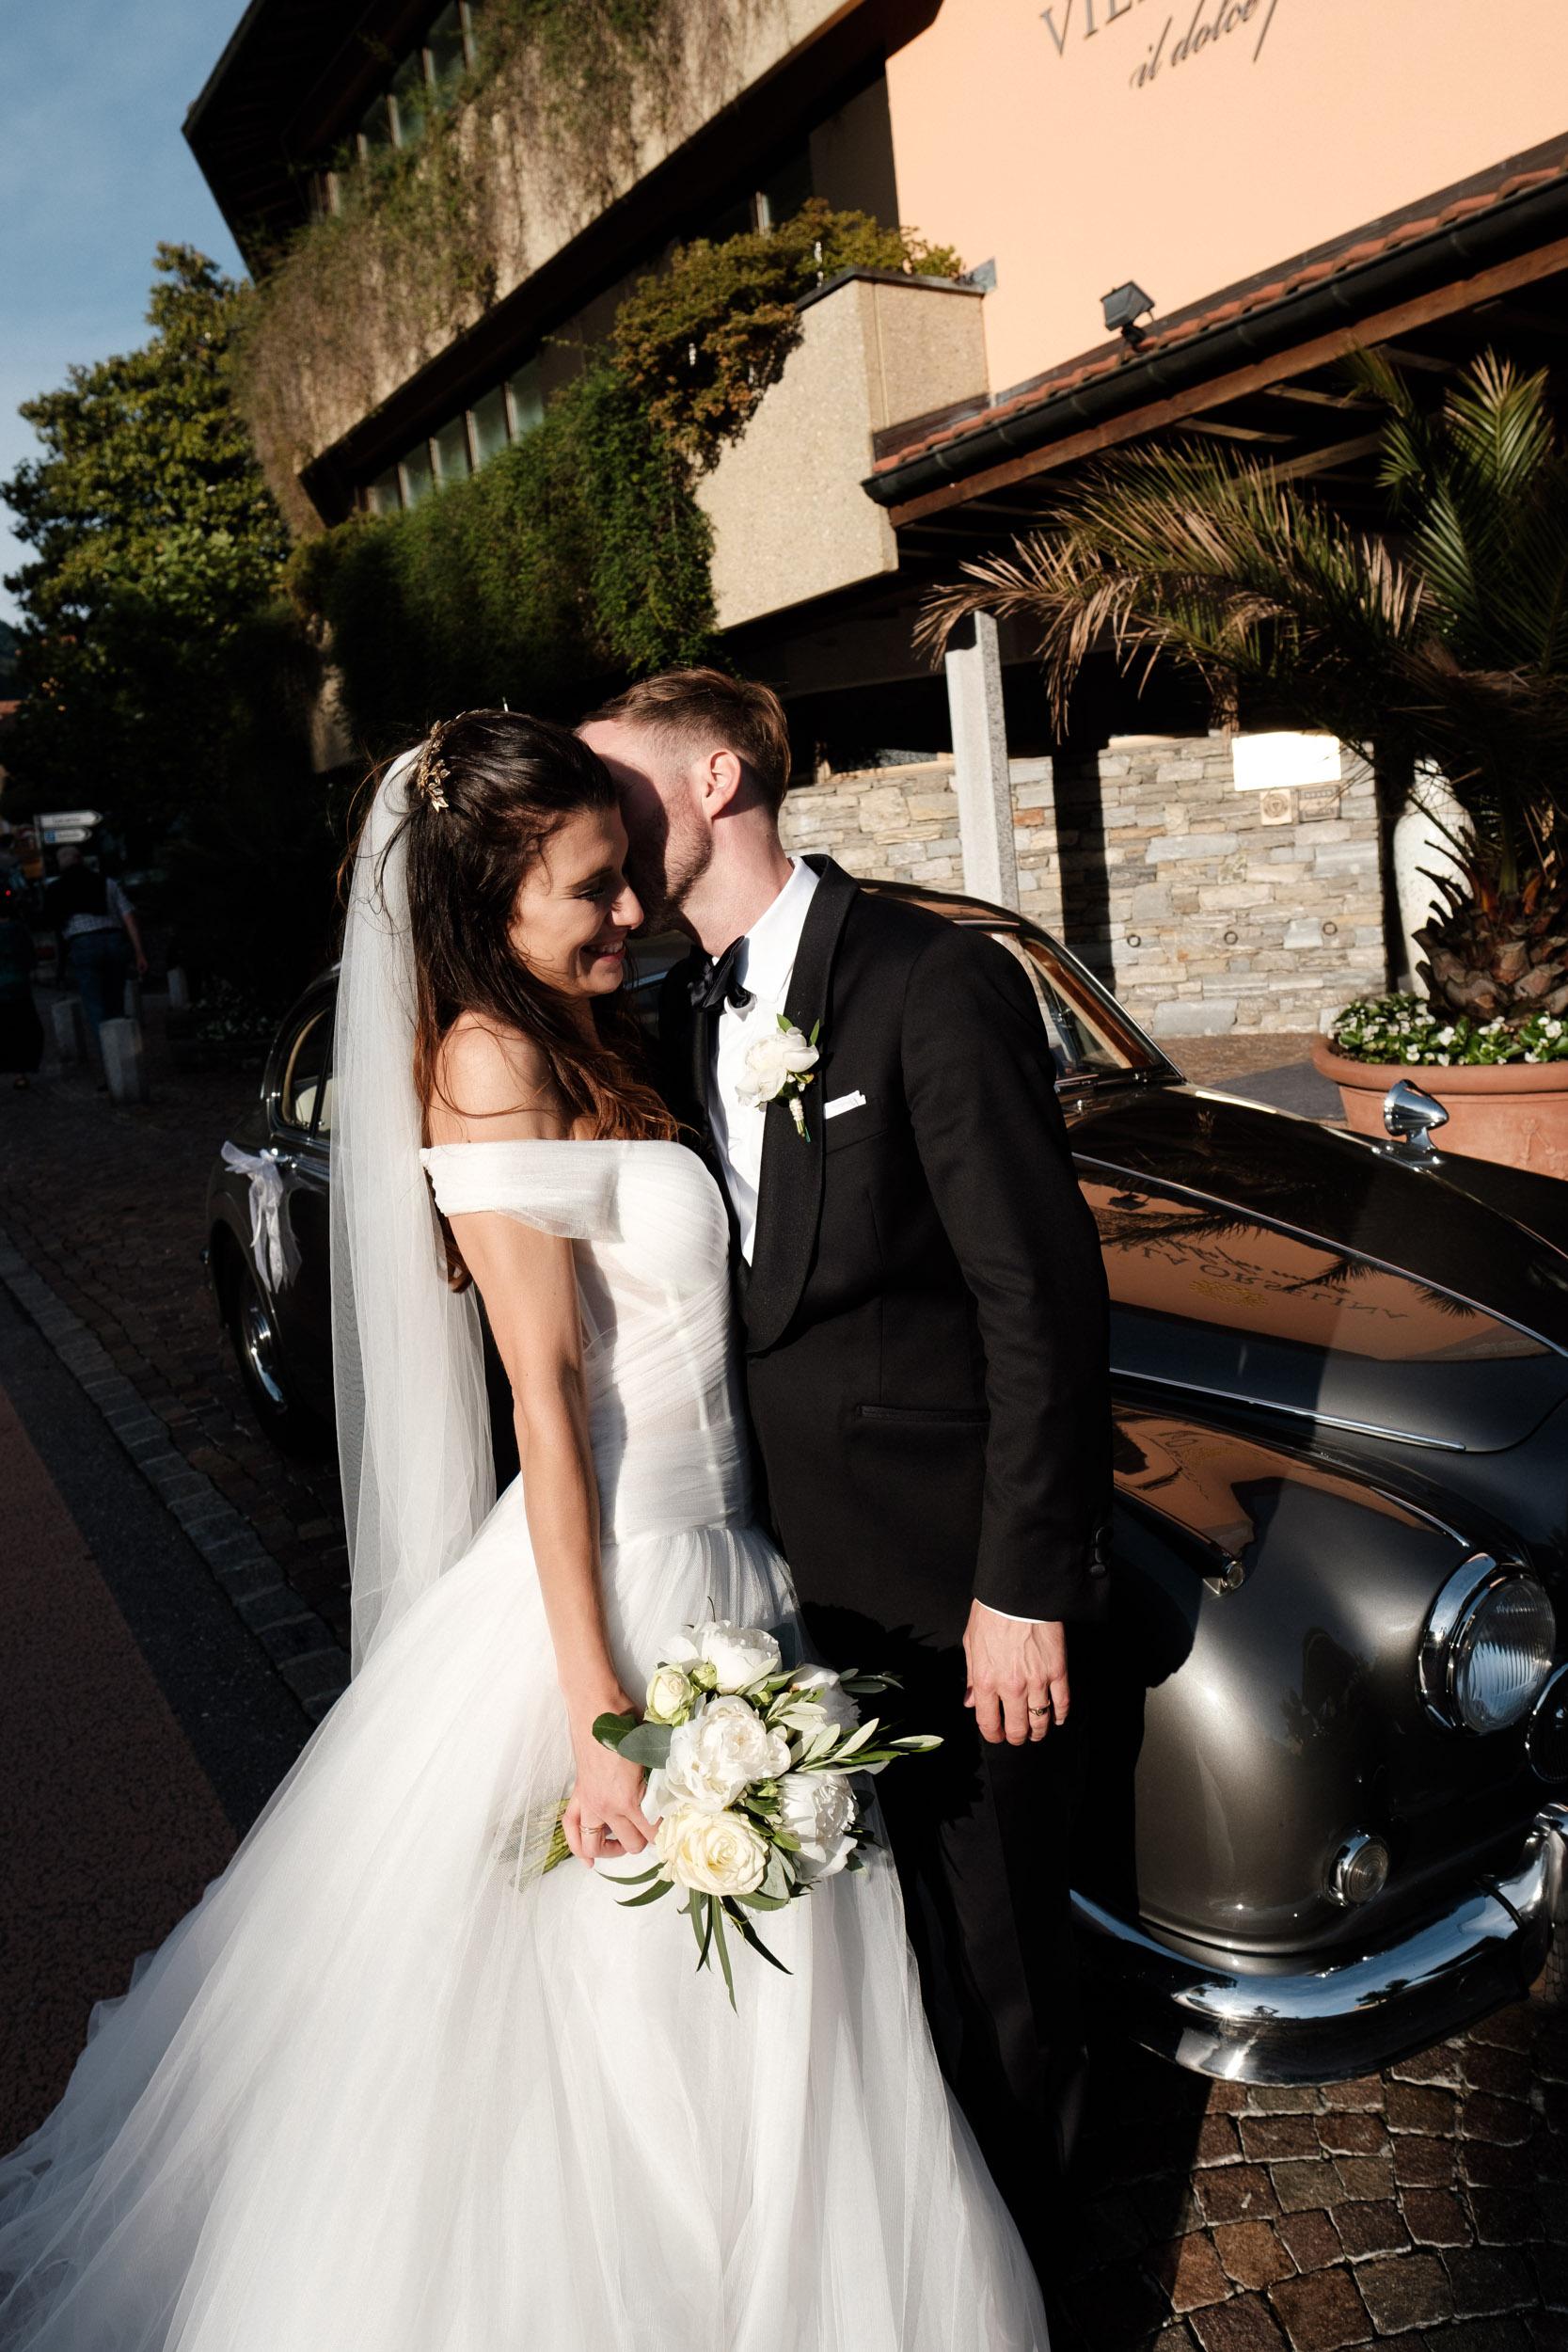 olivia-andreas-wedding-switzerland-470.jpg